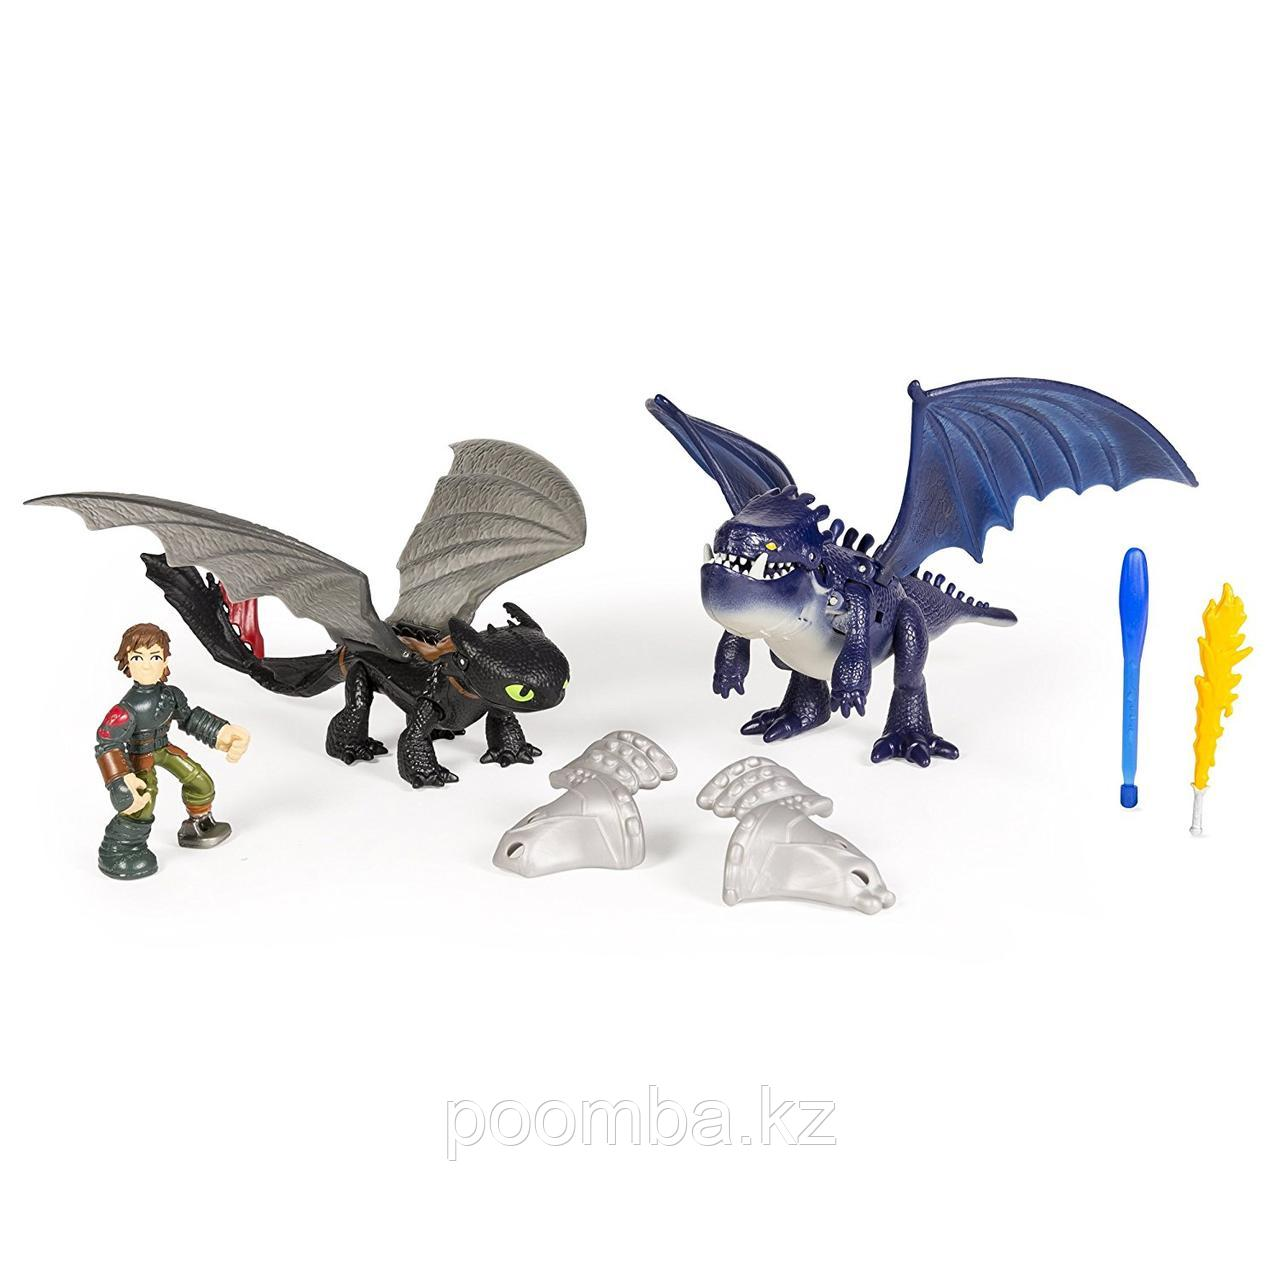 "Набор How To Train Your Dragon ""Беззубик и Иккинг против синего дракона"""